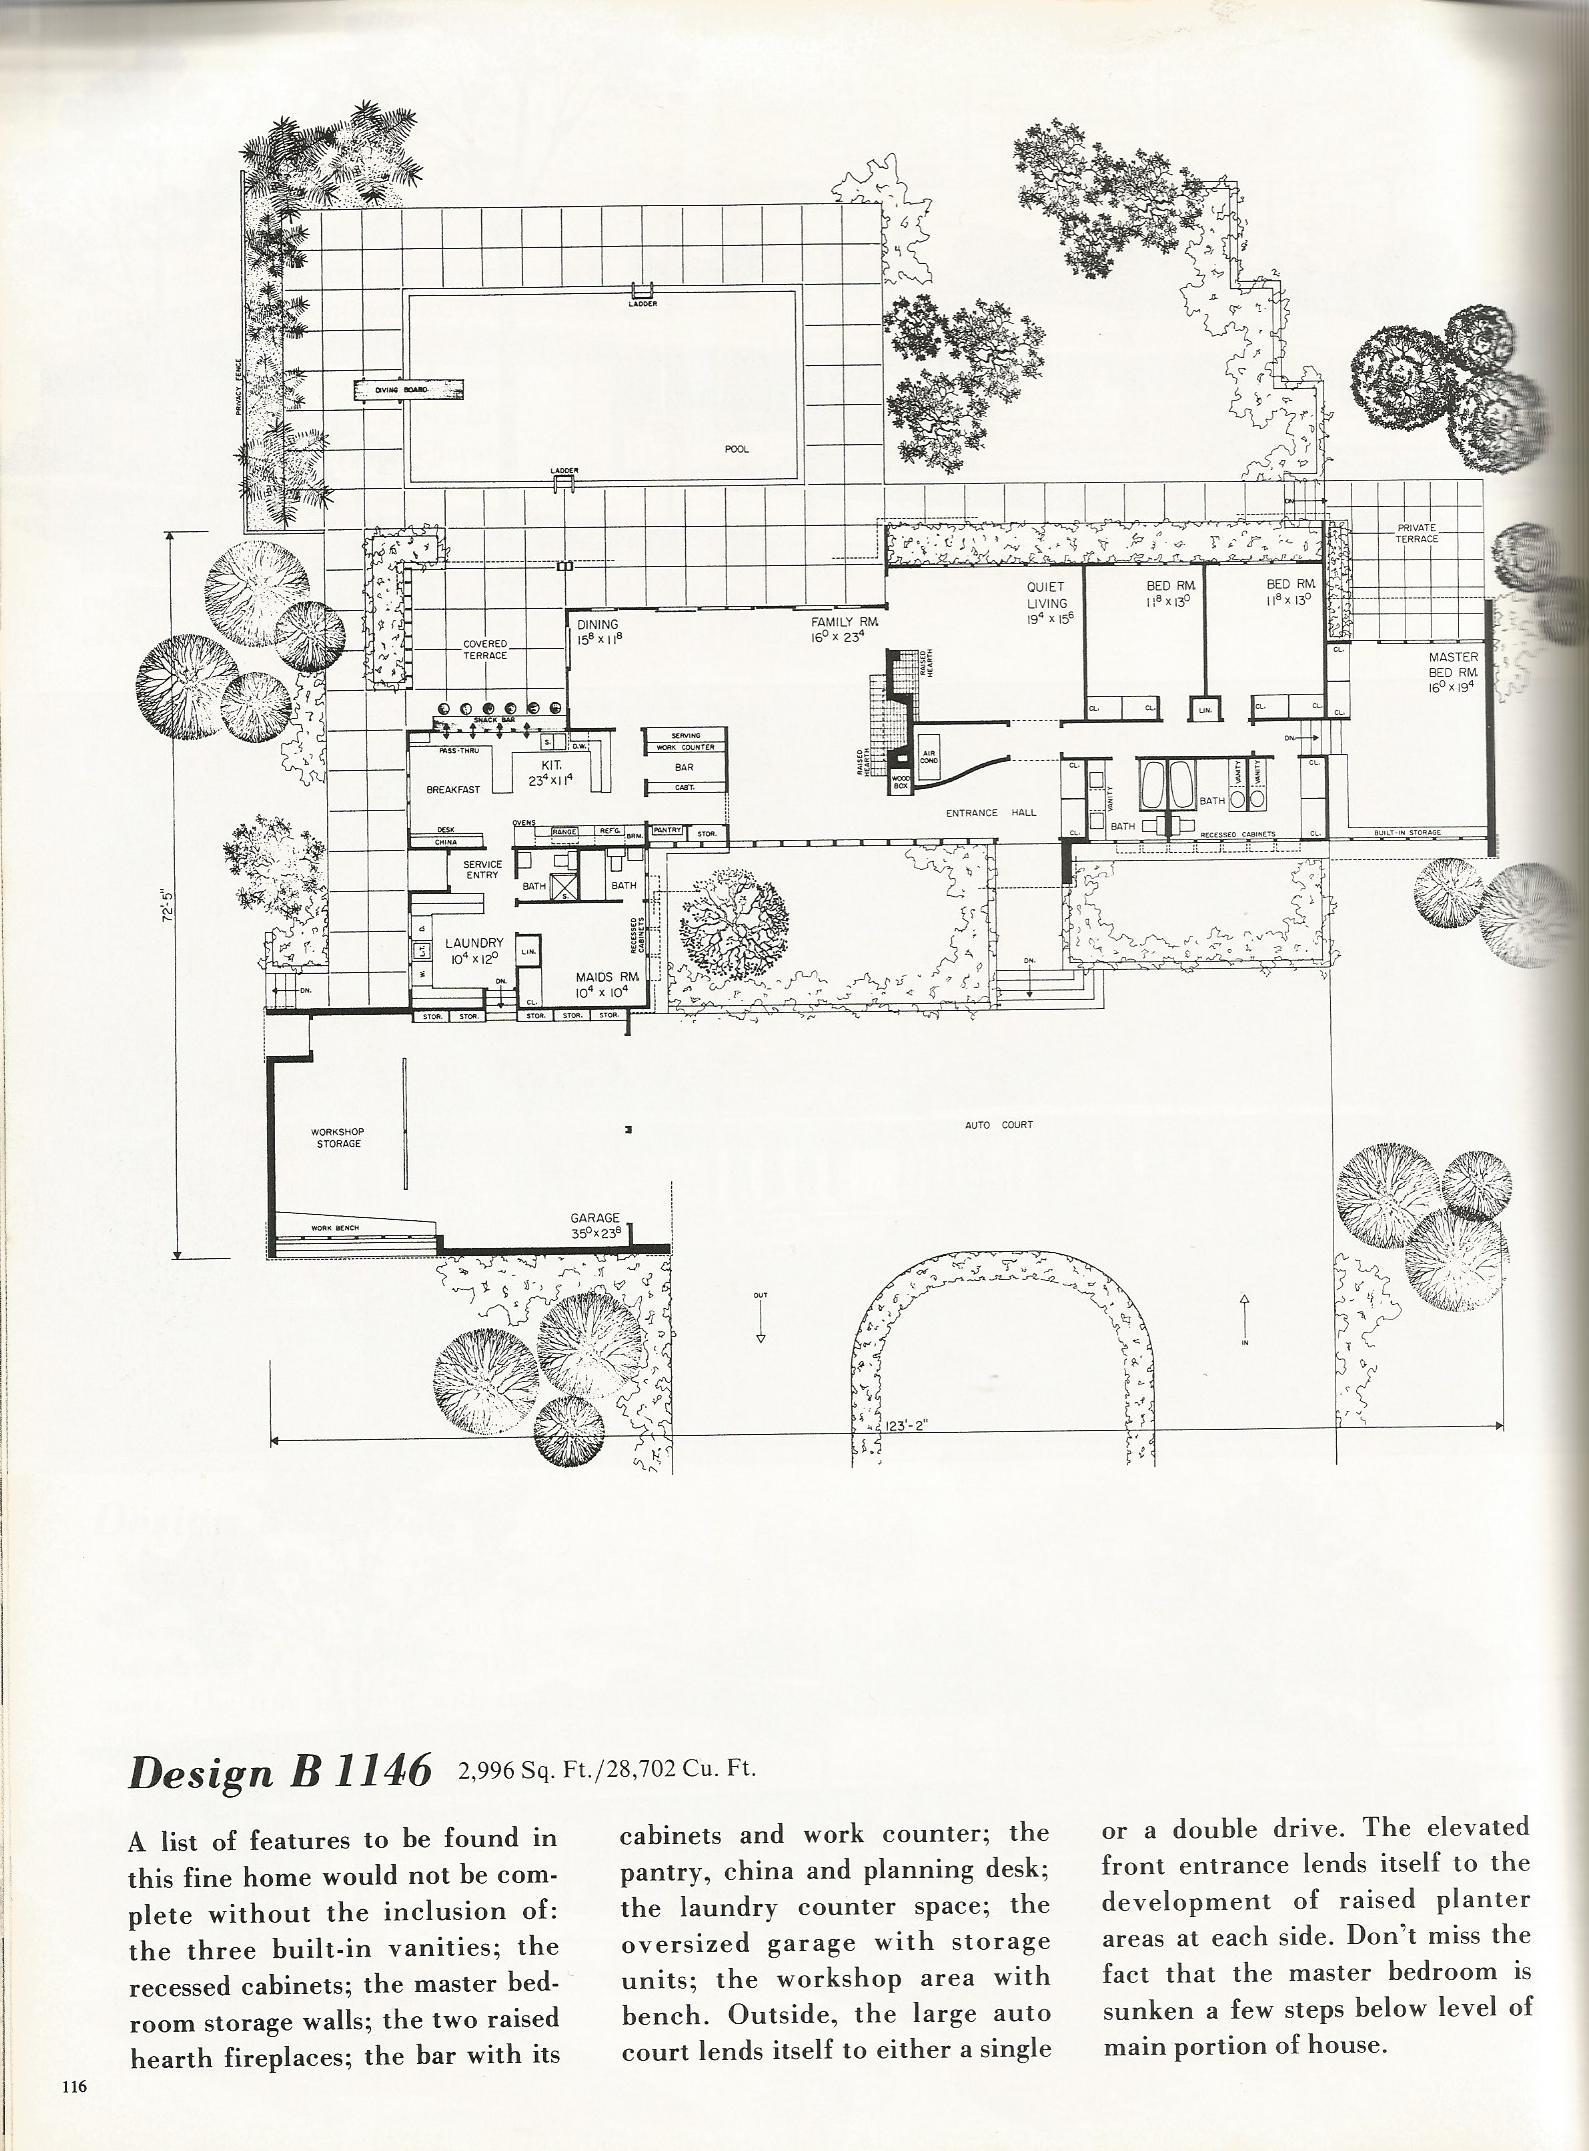 Vintage house plans country estates 1146a antique alter ego for Large estate home plans